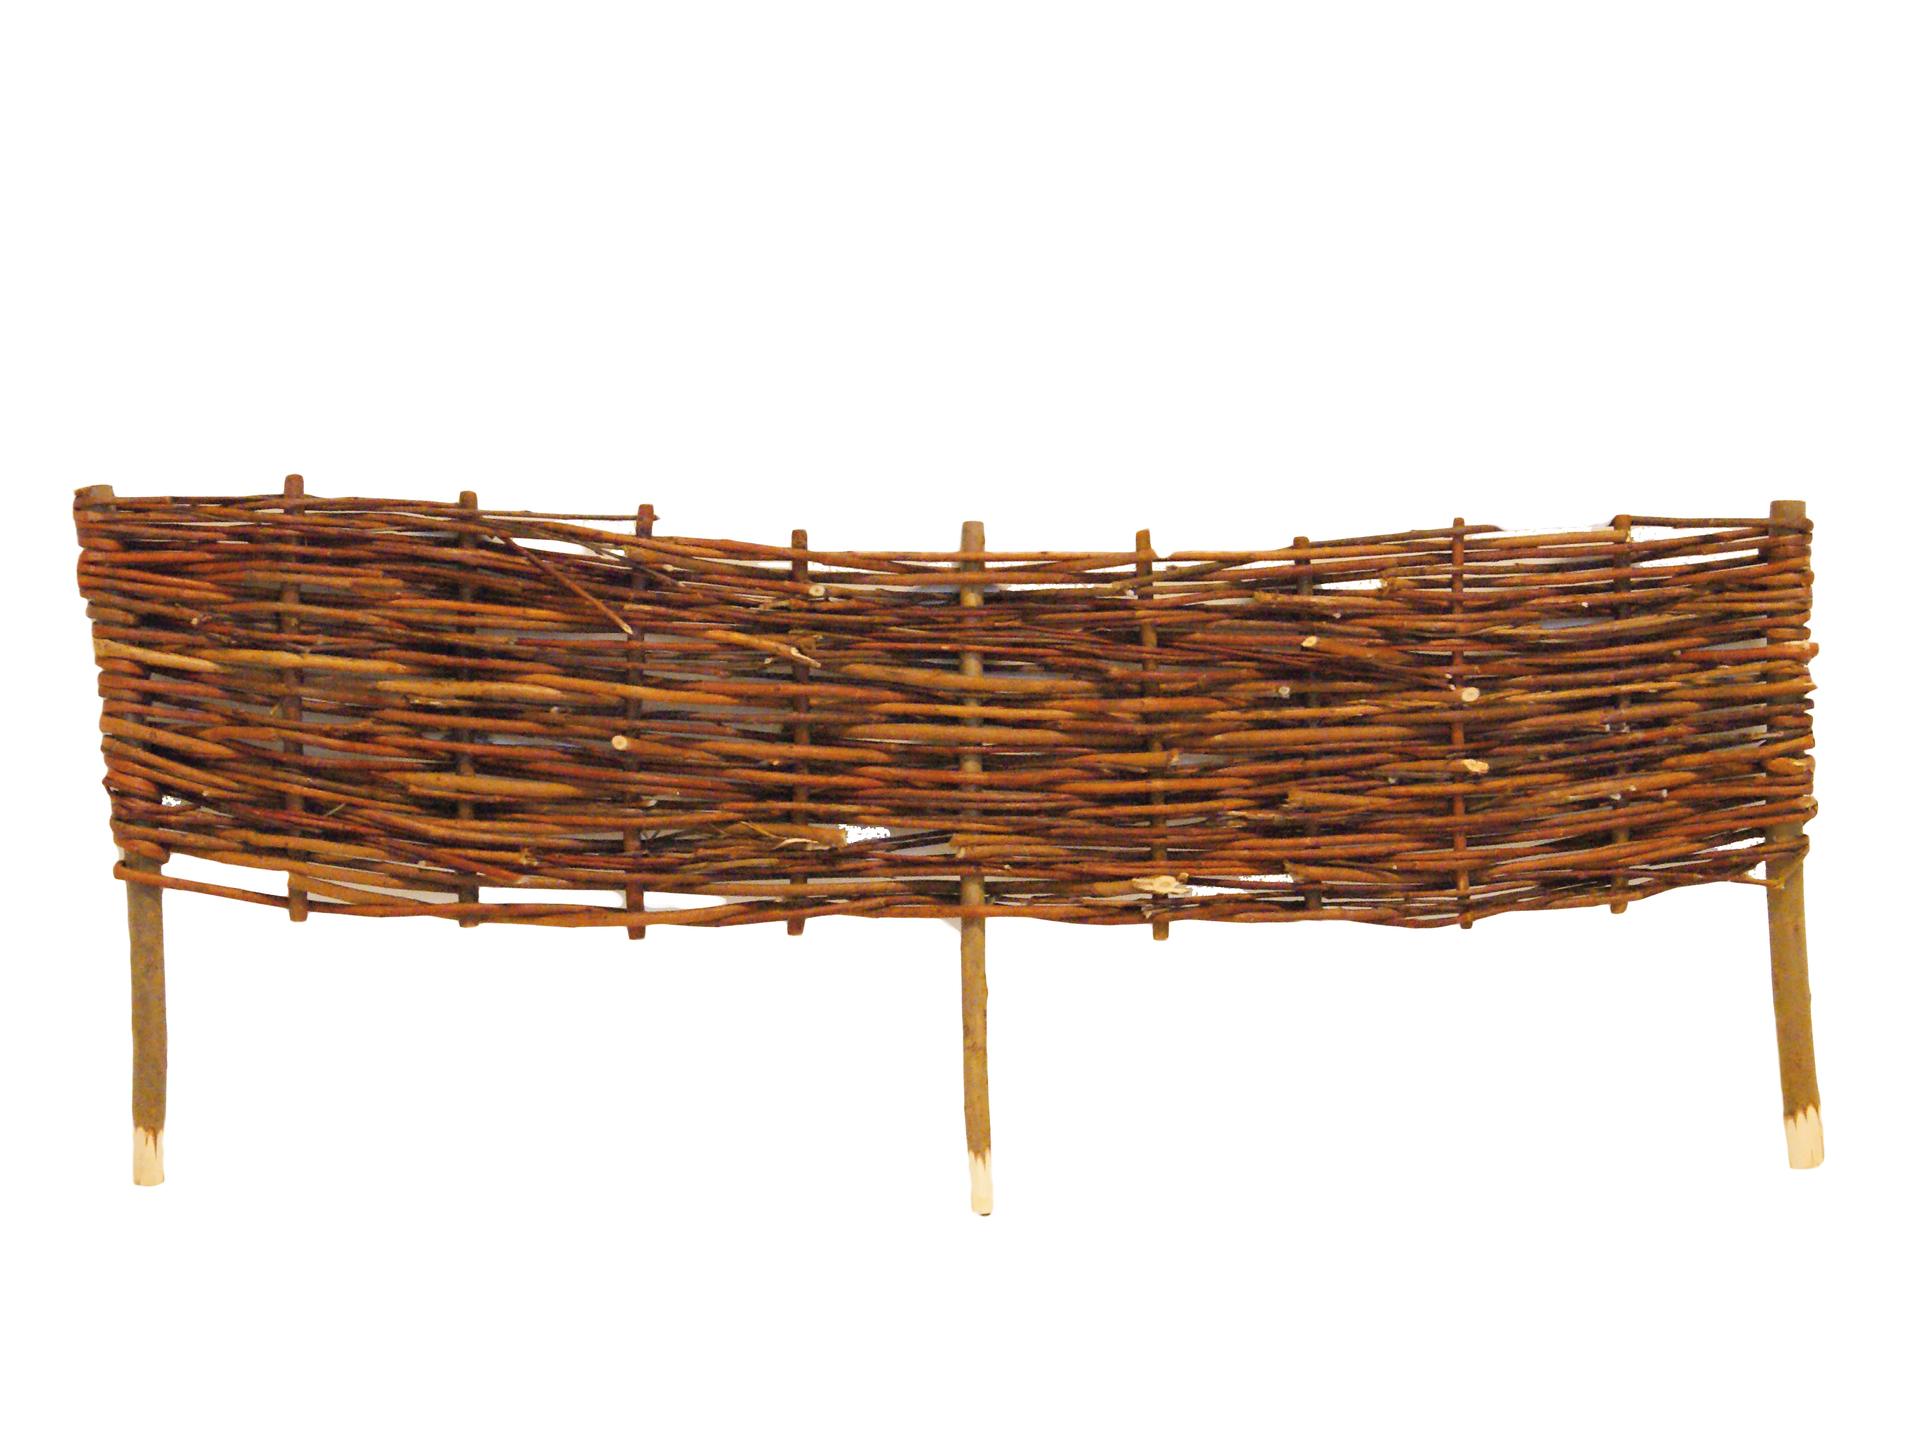 Orba bordure en bois de saule tressé 90x22,5 cm